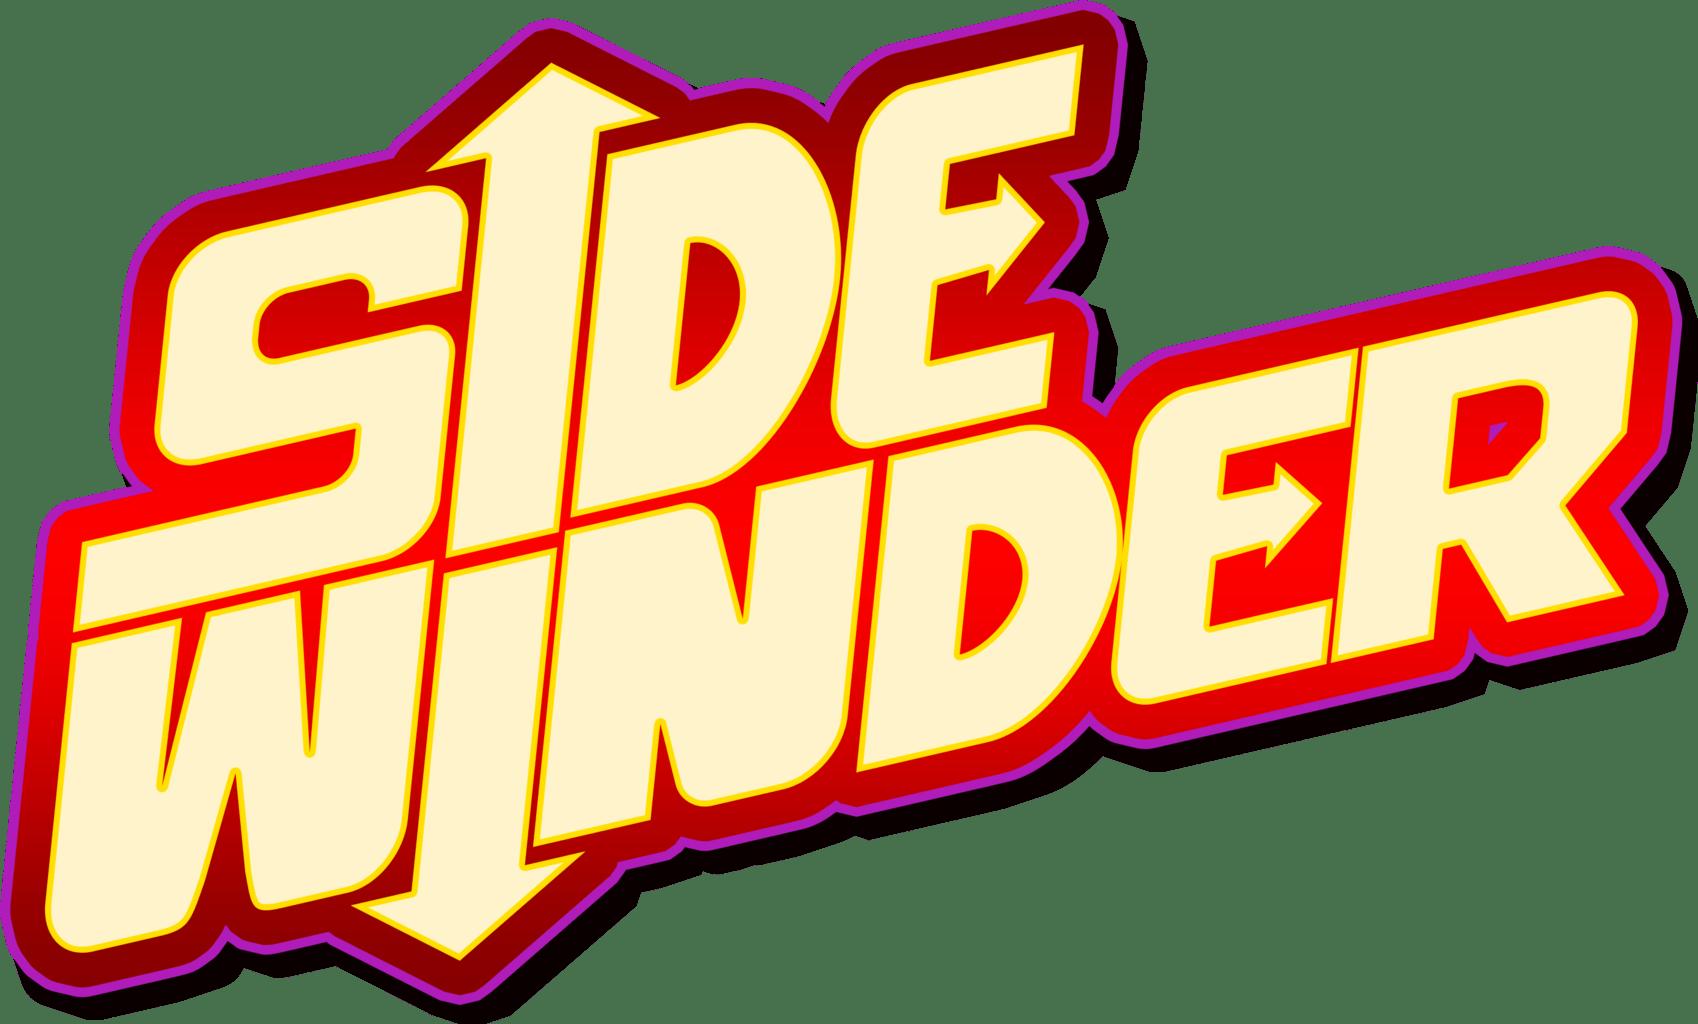 JFTW - Sidewinder - logo - casinogroundsdotcom